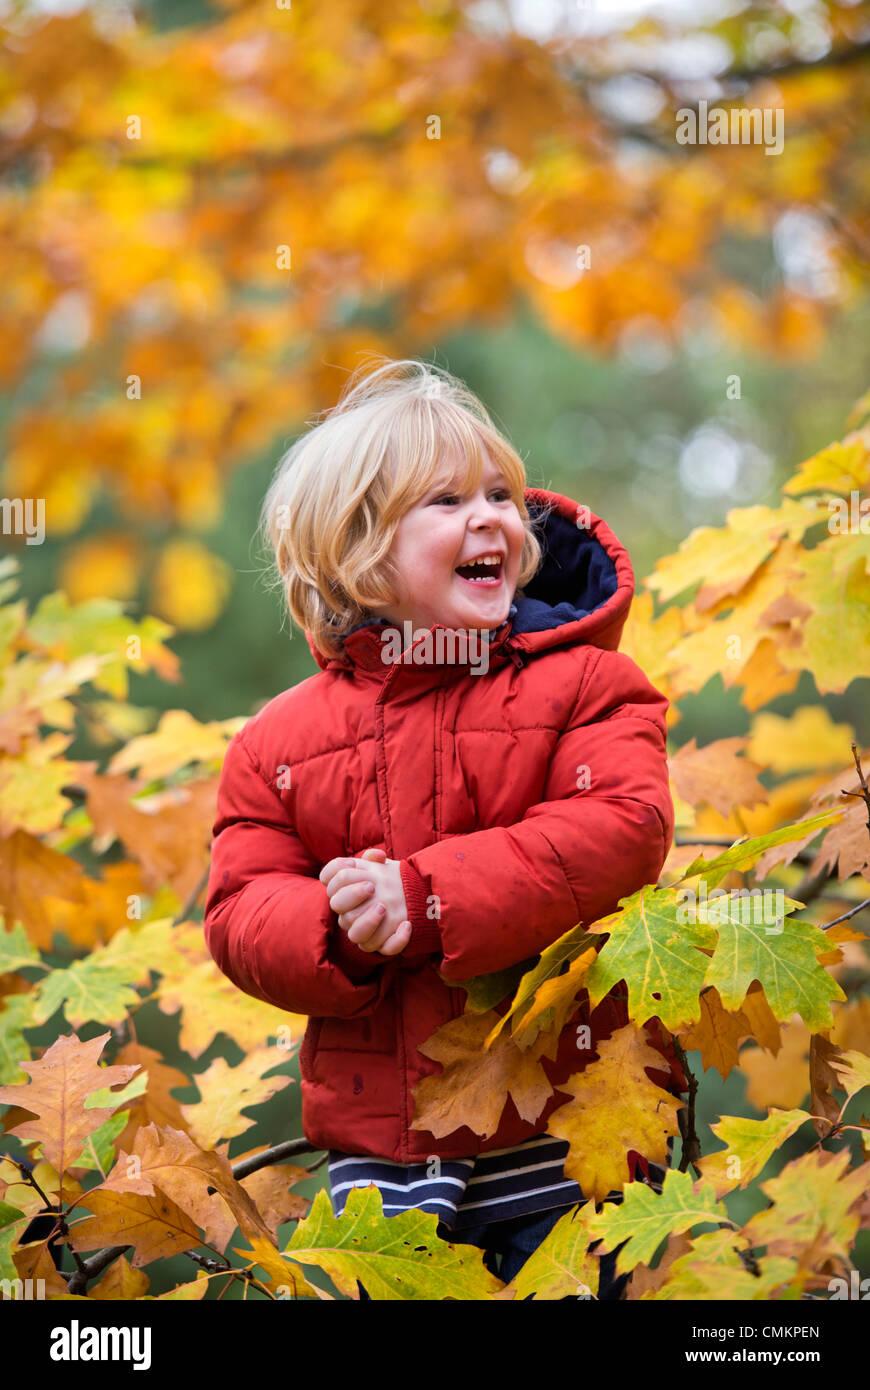 A three year old boy playing amongst the leaves at Westonbirt Arboretum Credit:  Adrian Sherratt/Alamy Live News - Stock Image